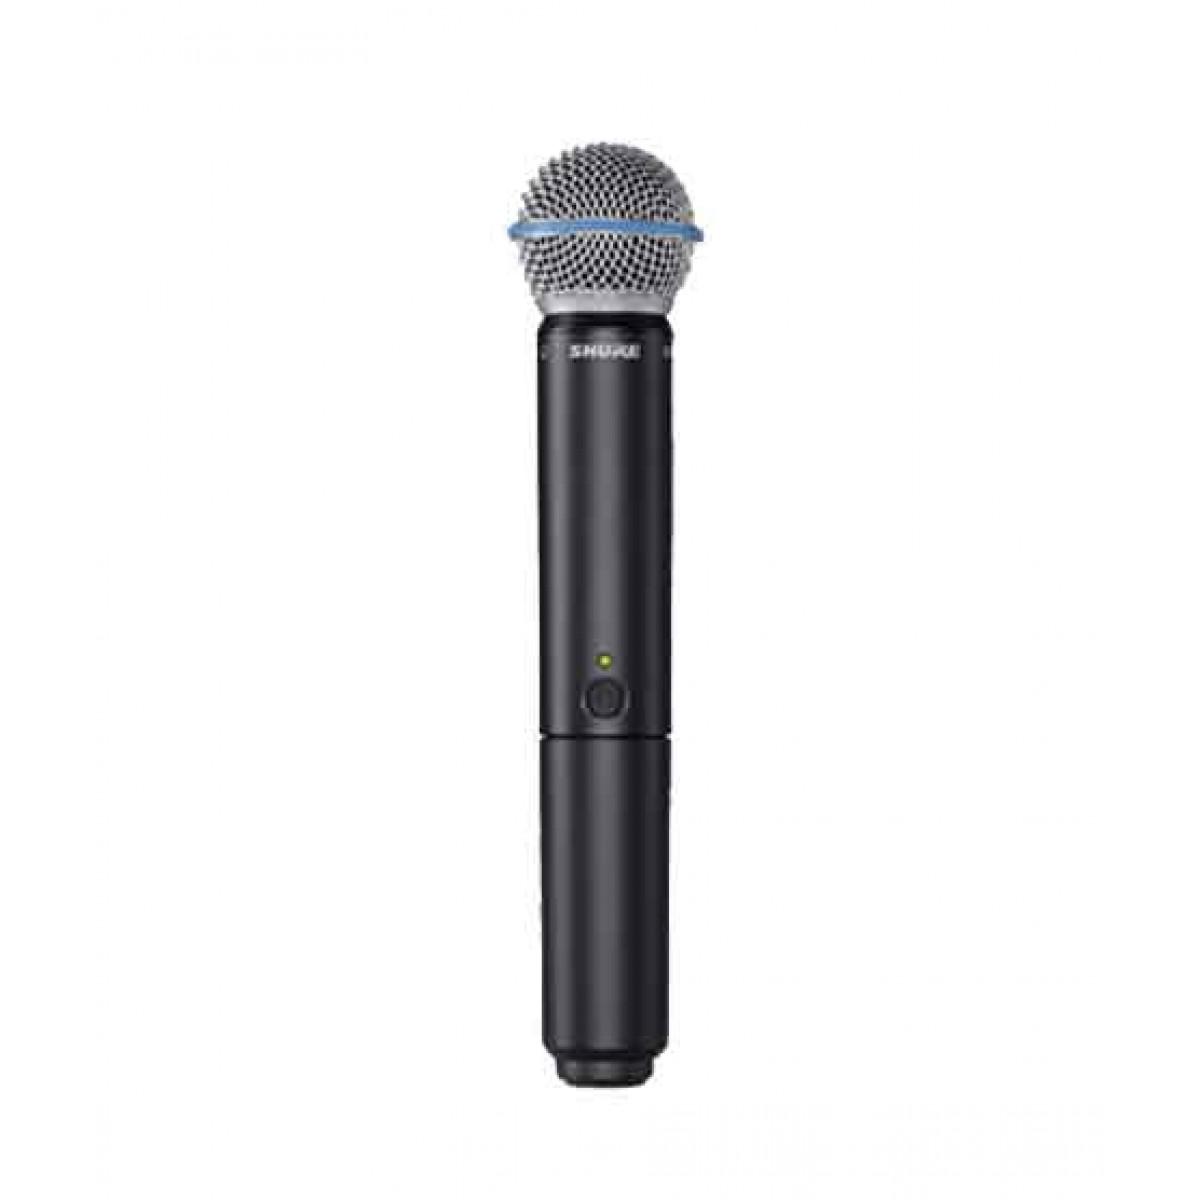 Shure Handheld Wireless Microphone Transmitter (BLX2/B58)